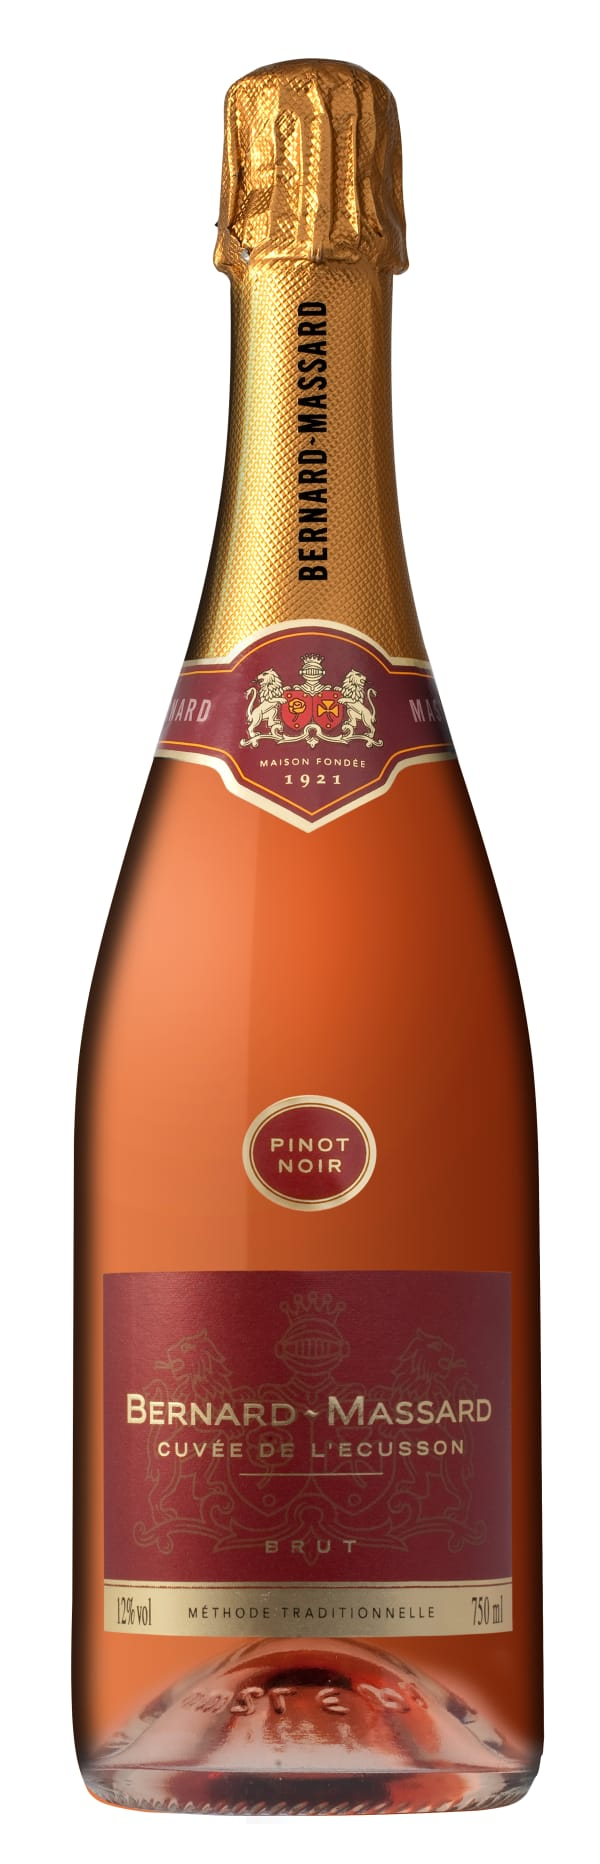 Bernard-Massard Cuvée de l'Ecusson Rosé Brut